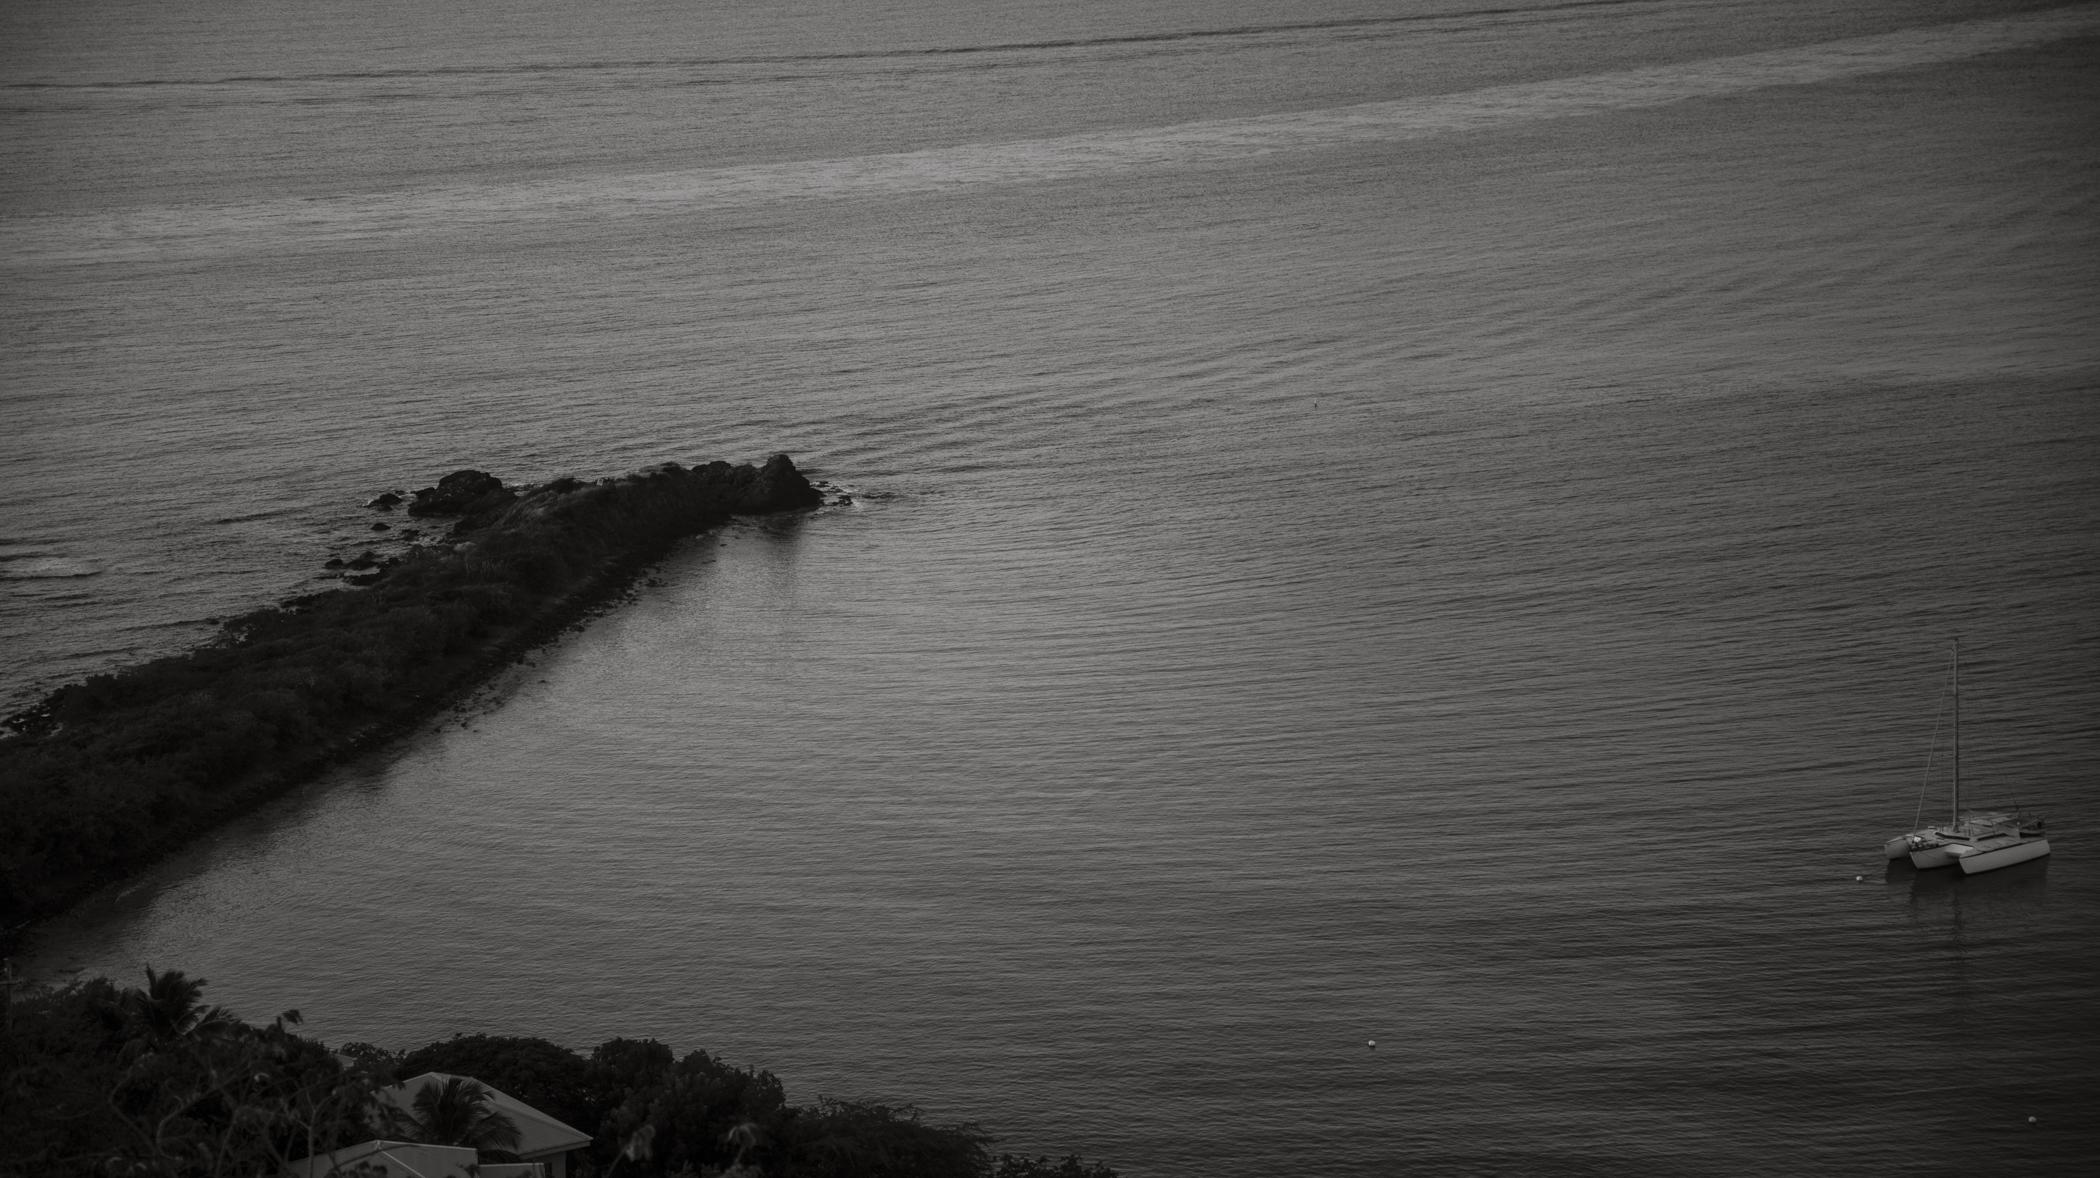 012014-Culebra-JuliaLuckettPhotography-144